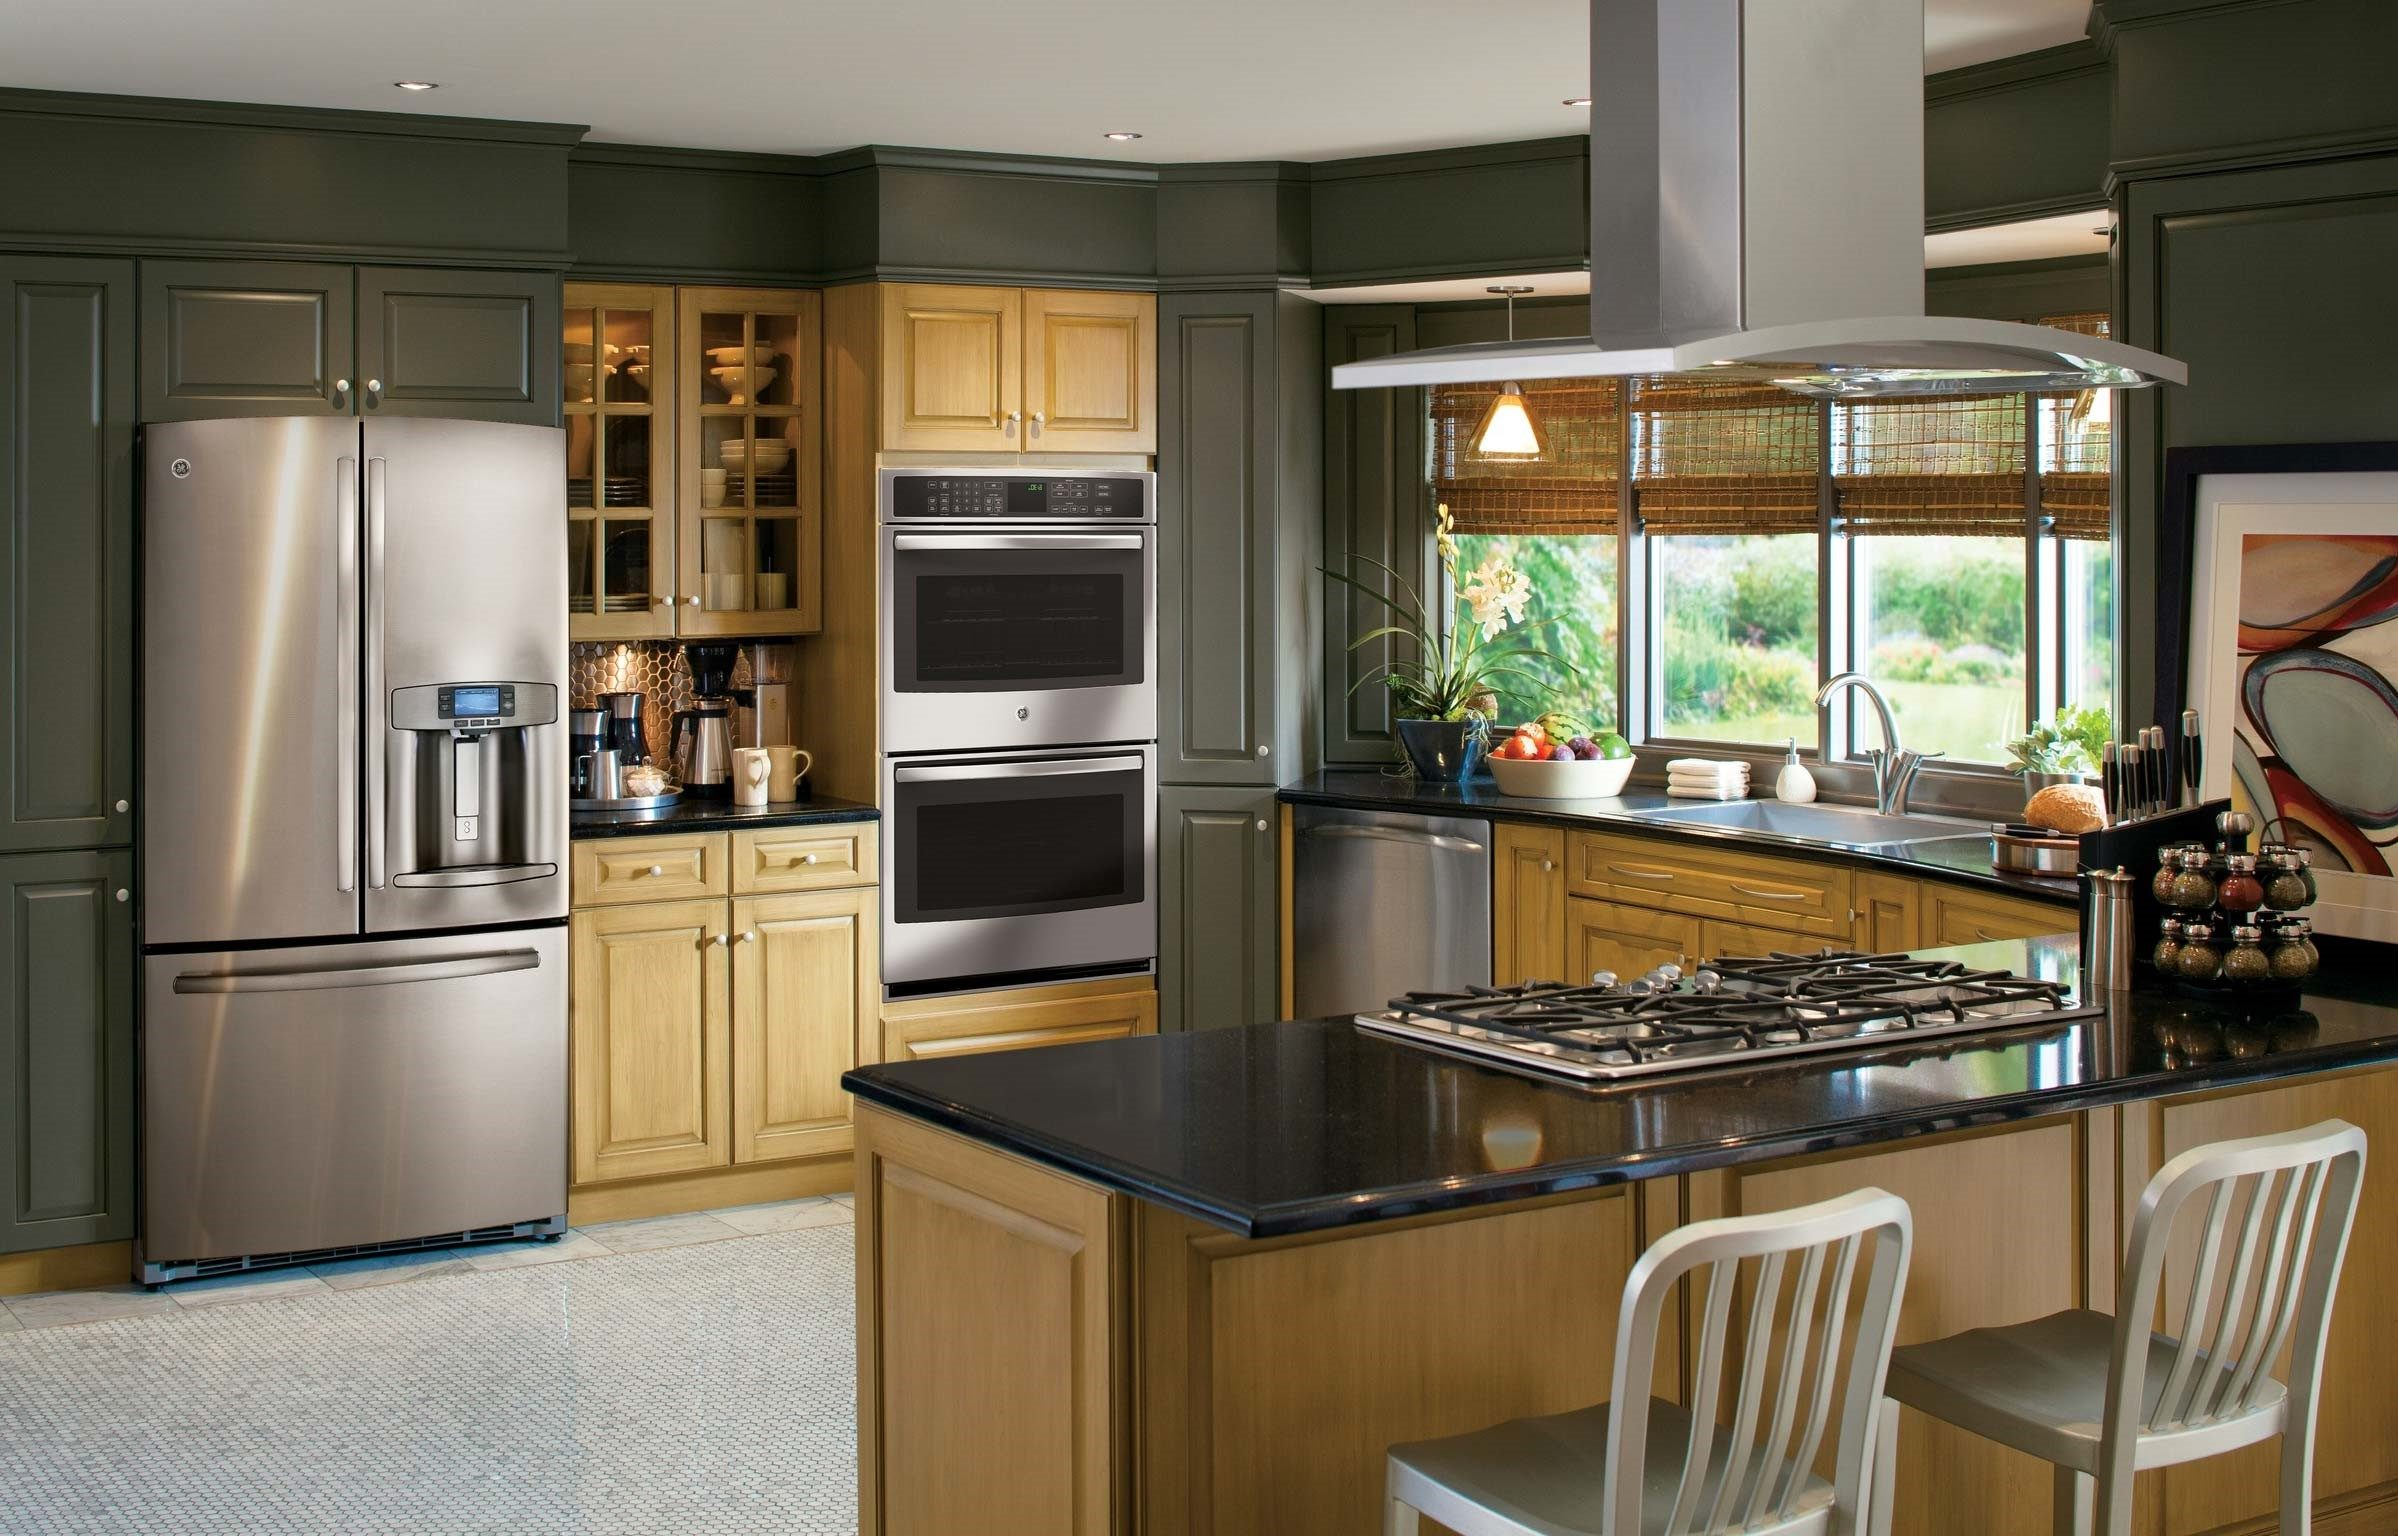 Bills Appliance Repair Service Bill S Appliance Service Is A Major